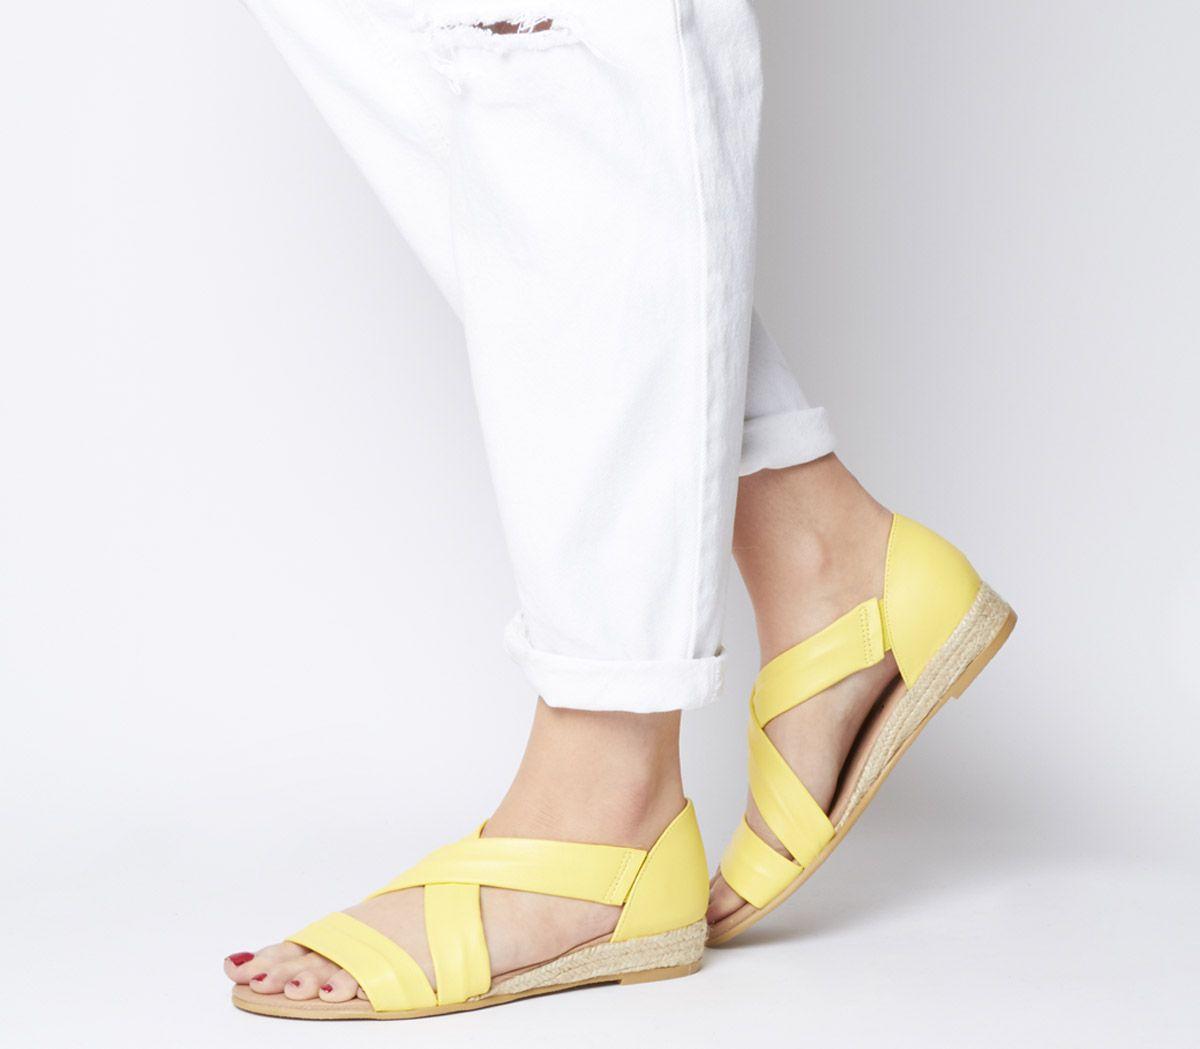 1ef3165aac94 Office Hallie Cross Strap Espadrilles Lemon Leather - Sandals